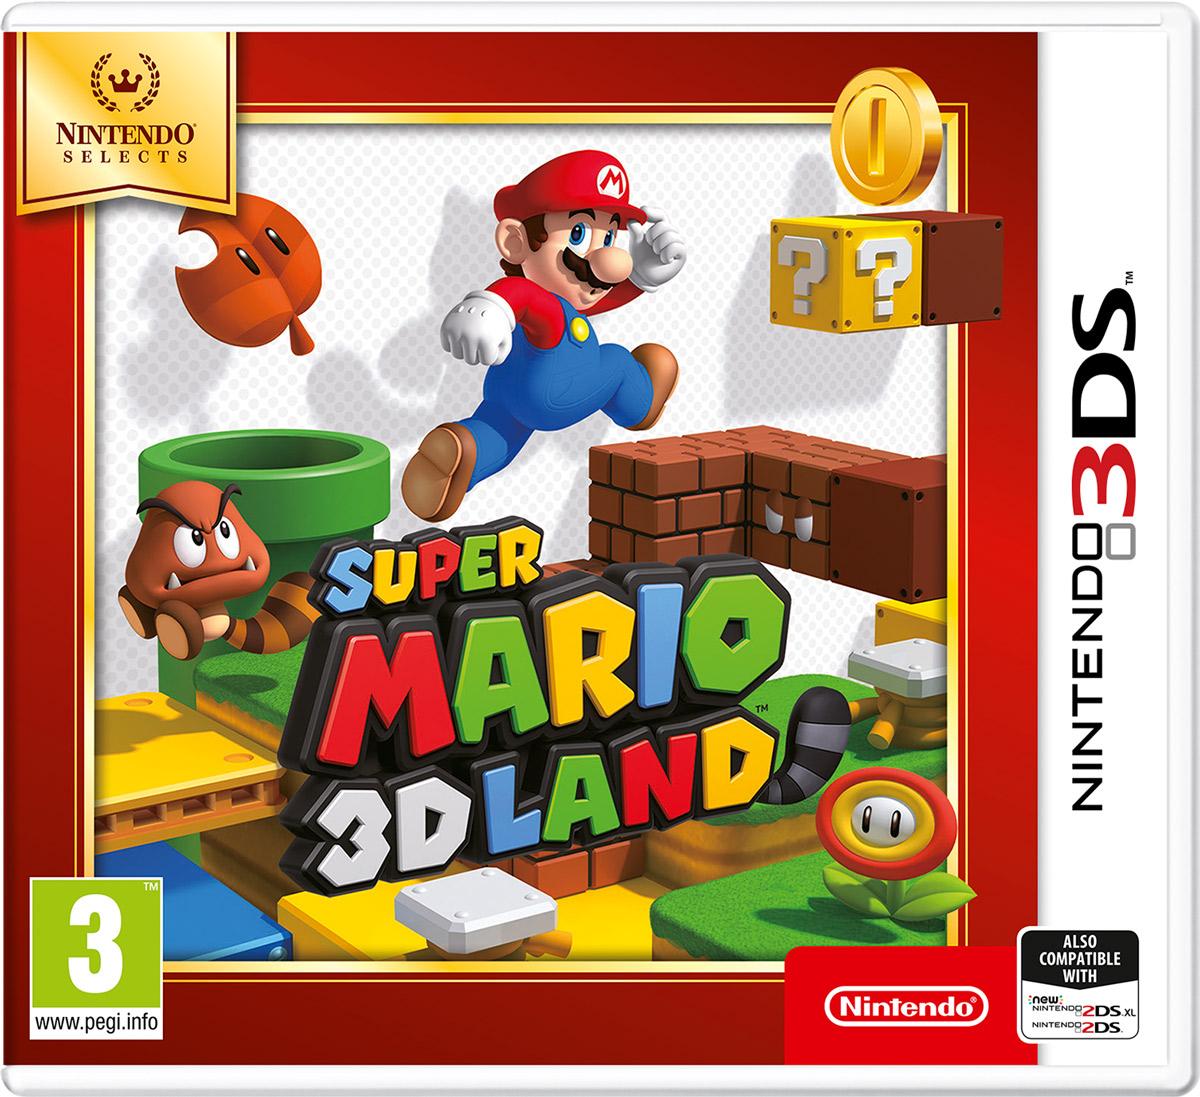 Nintendo Selects Super Mario 3D Land (3DS) работы марио тестино